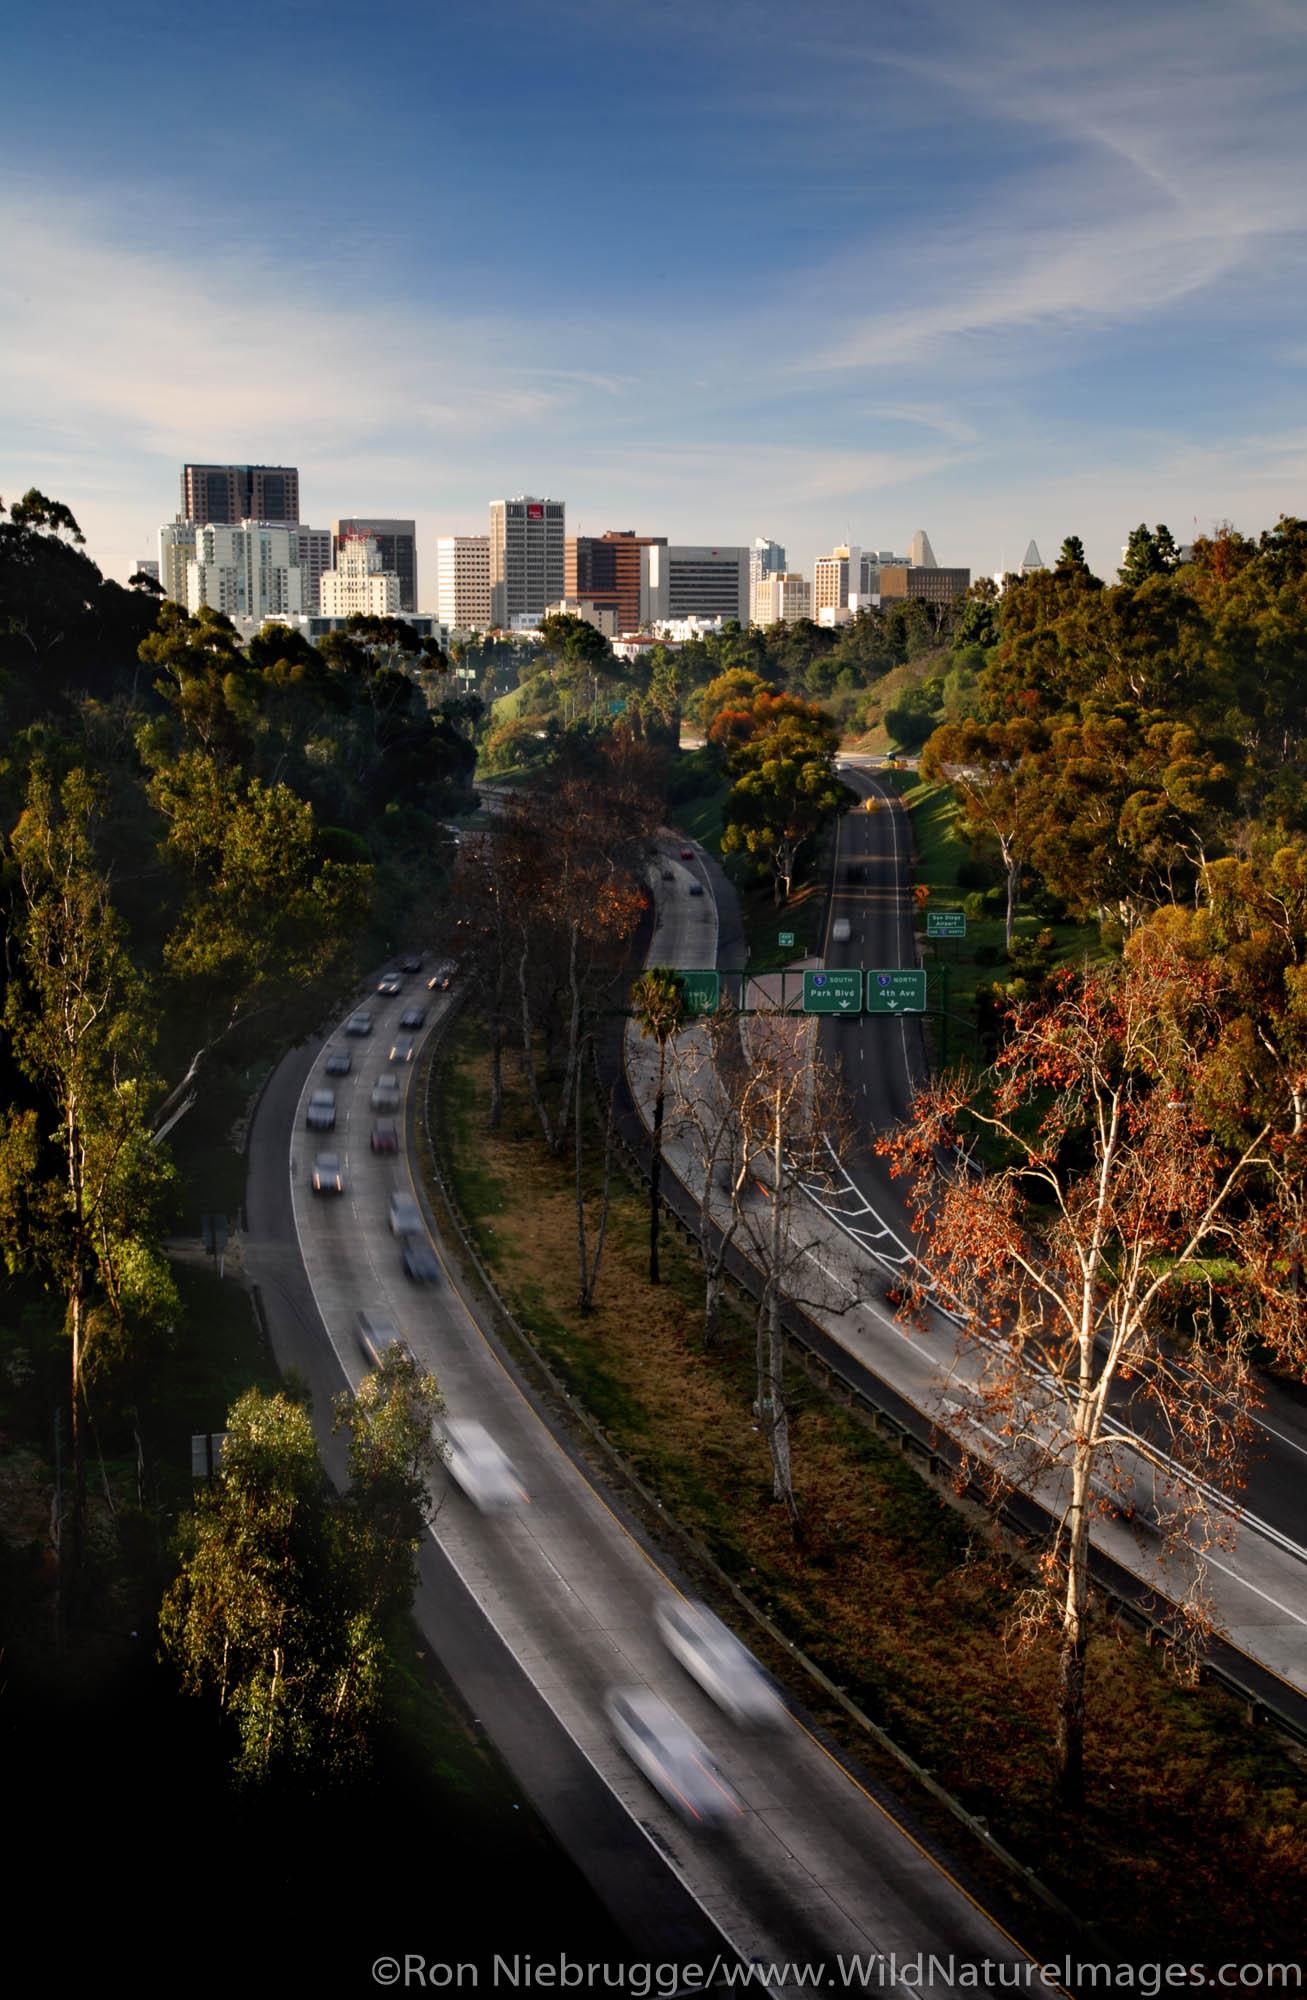 The downtown skyline from the Cabrillo Bridge, Balboa Park, San Diego, California.